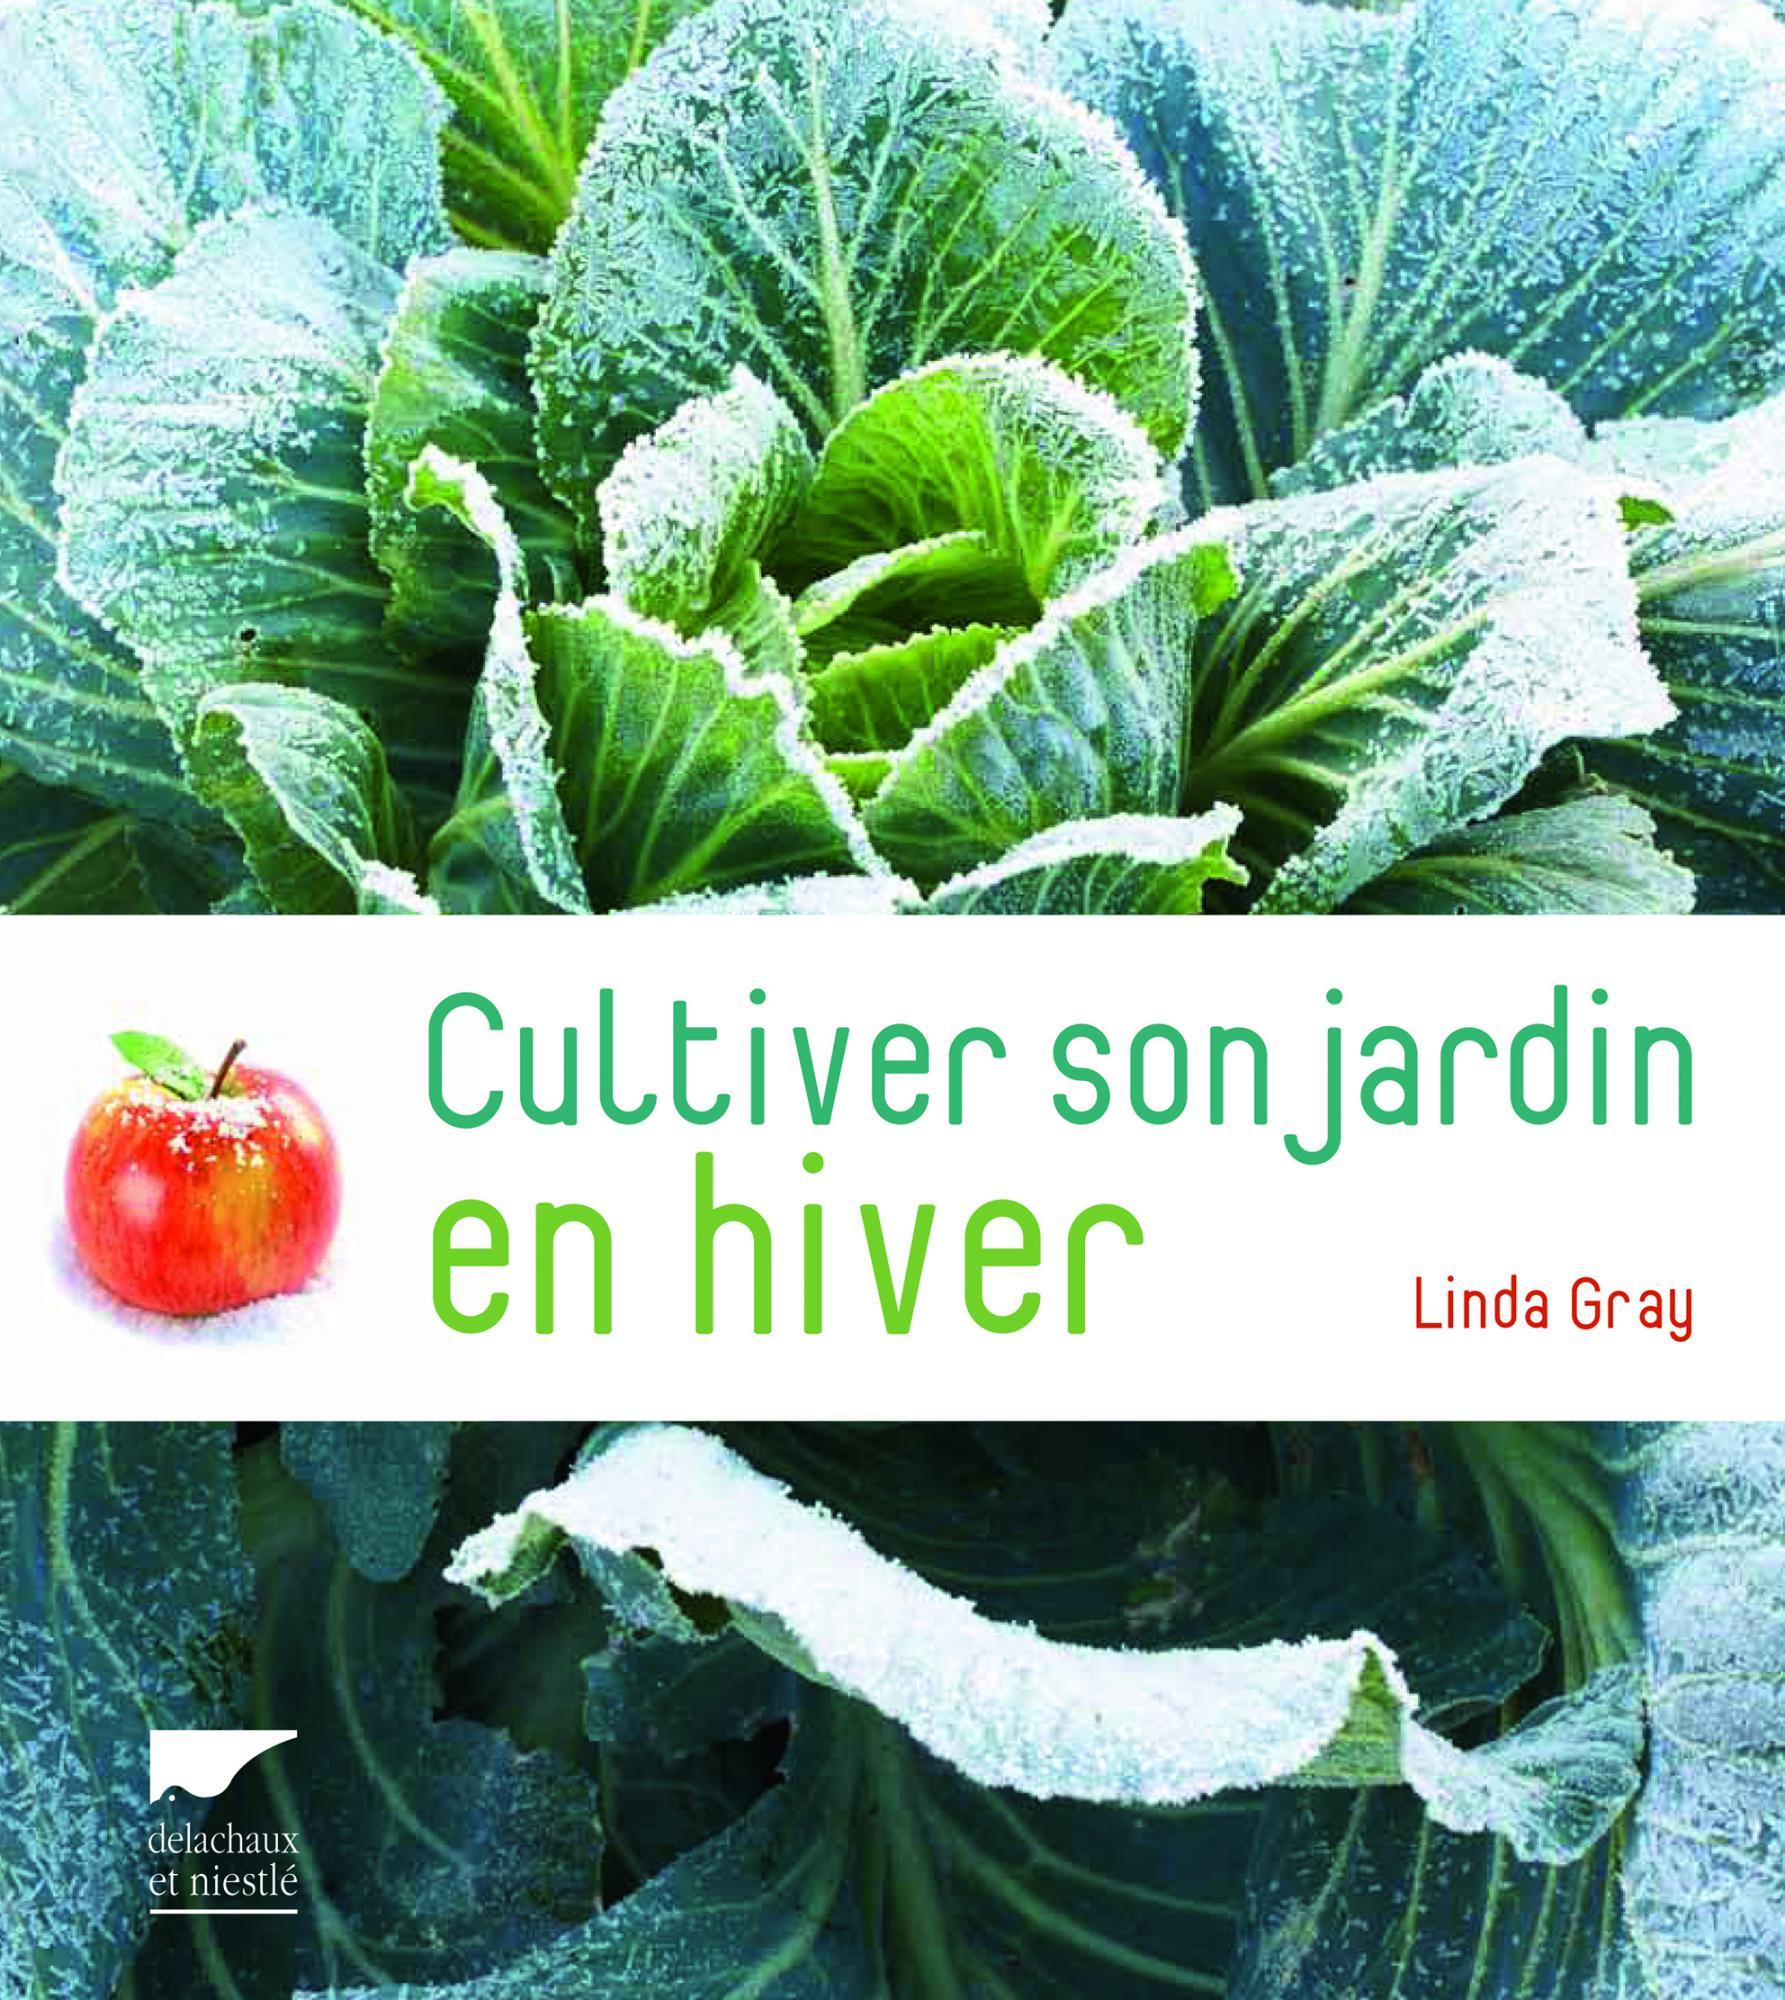 Cultiver son jardin en hiver linda gray so what for Jardin en hiver